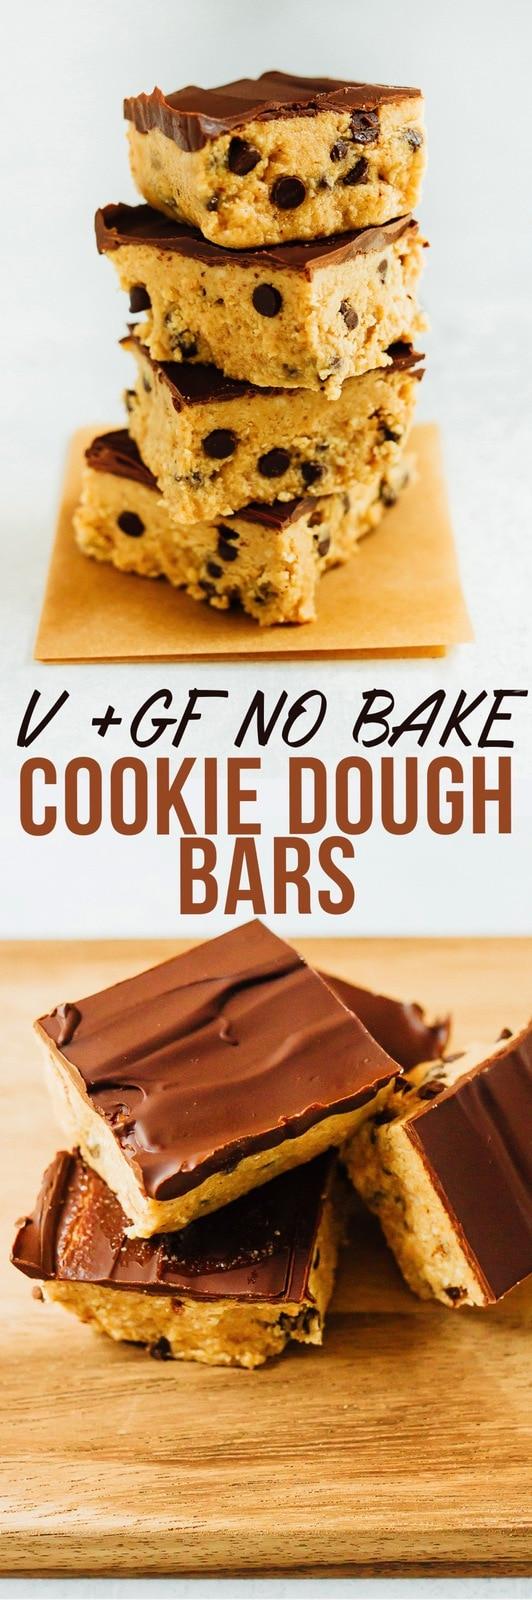 No Bake VEGAN GLUTEN-FREE Cookie Dough Bars